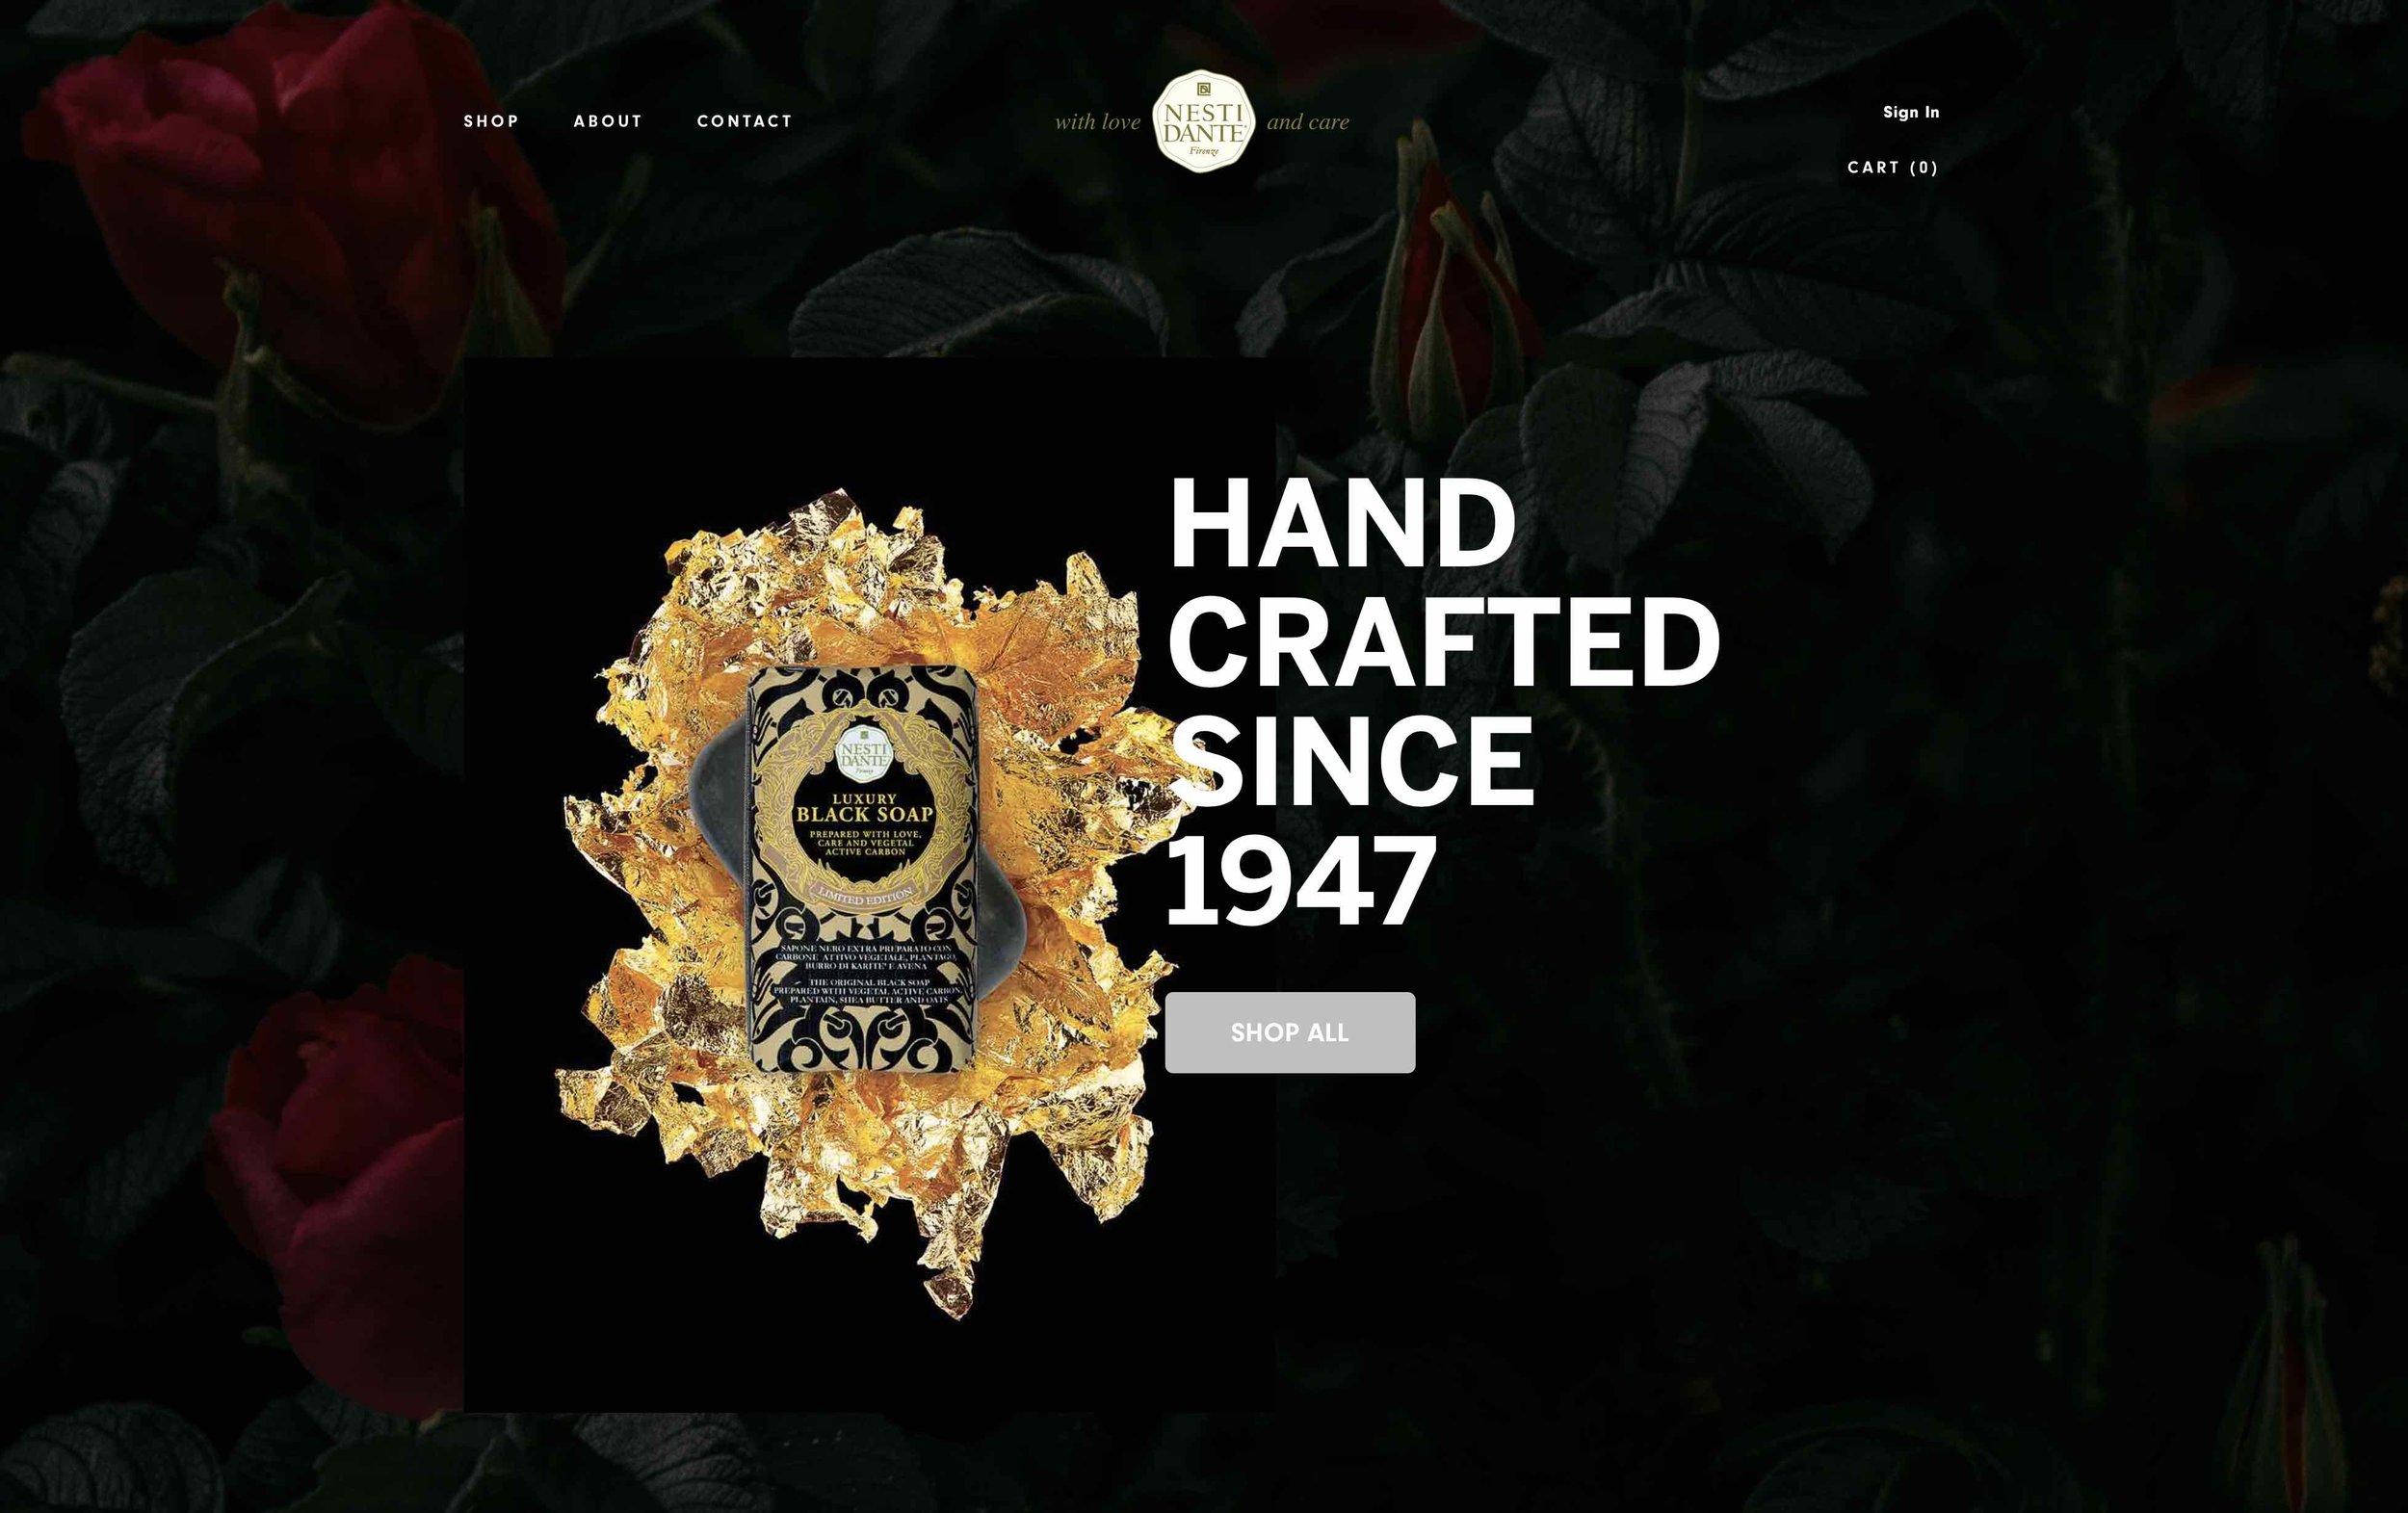 NESTI DANTE's Website→ -